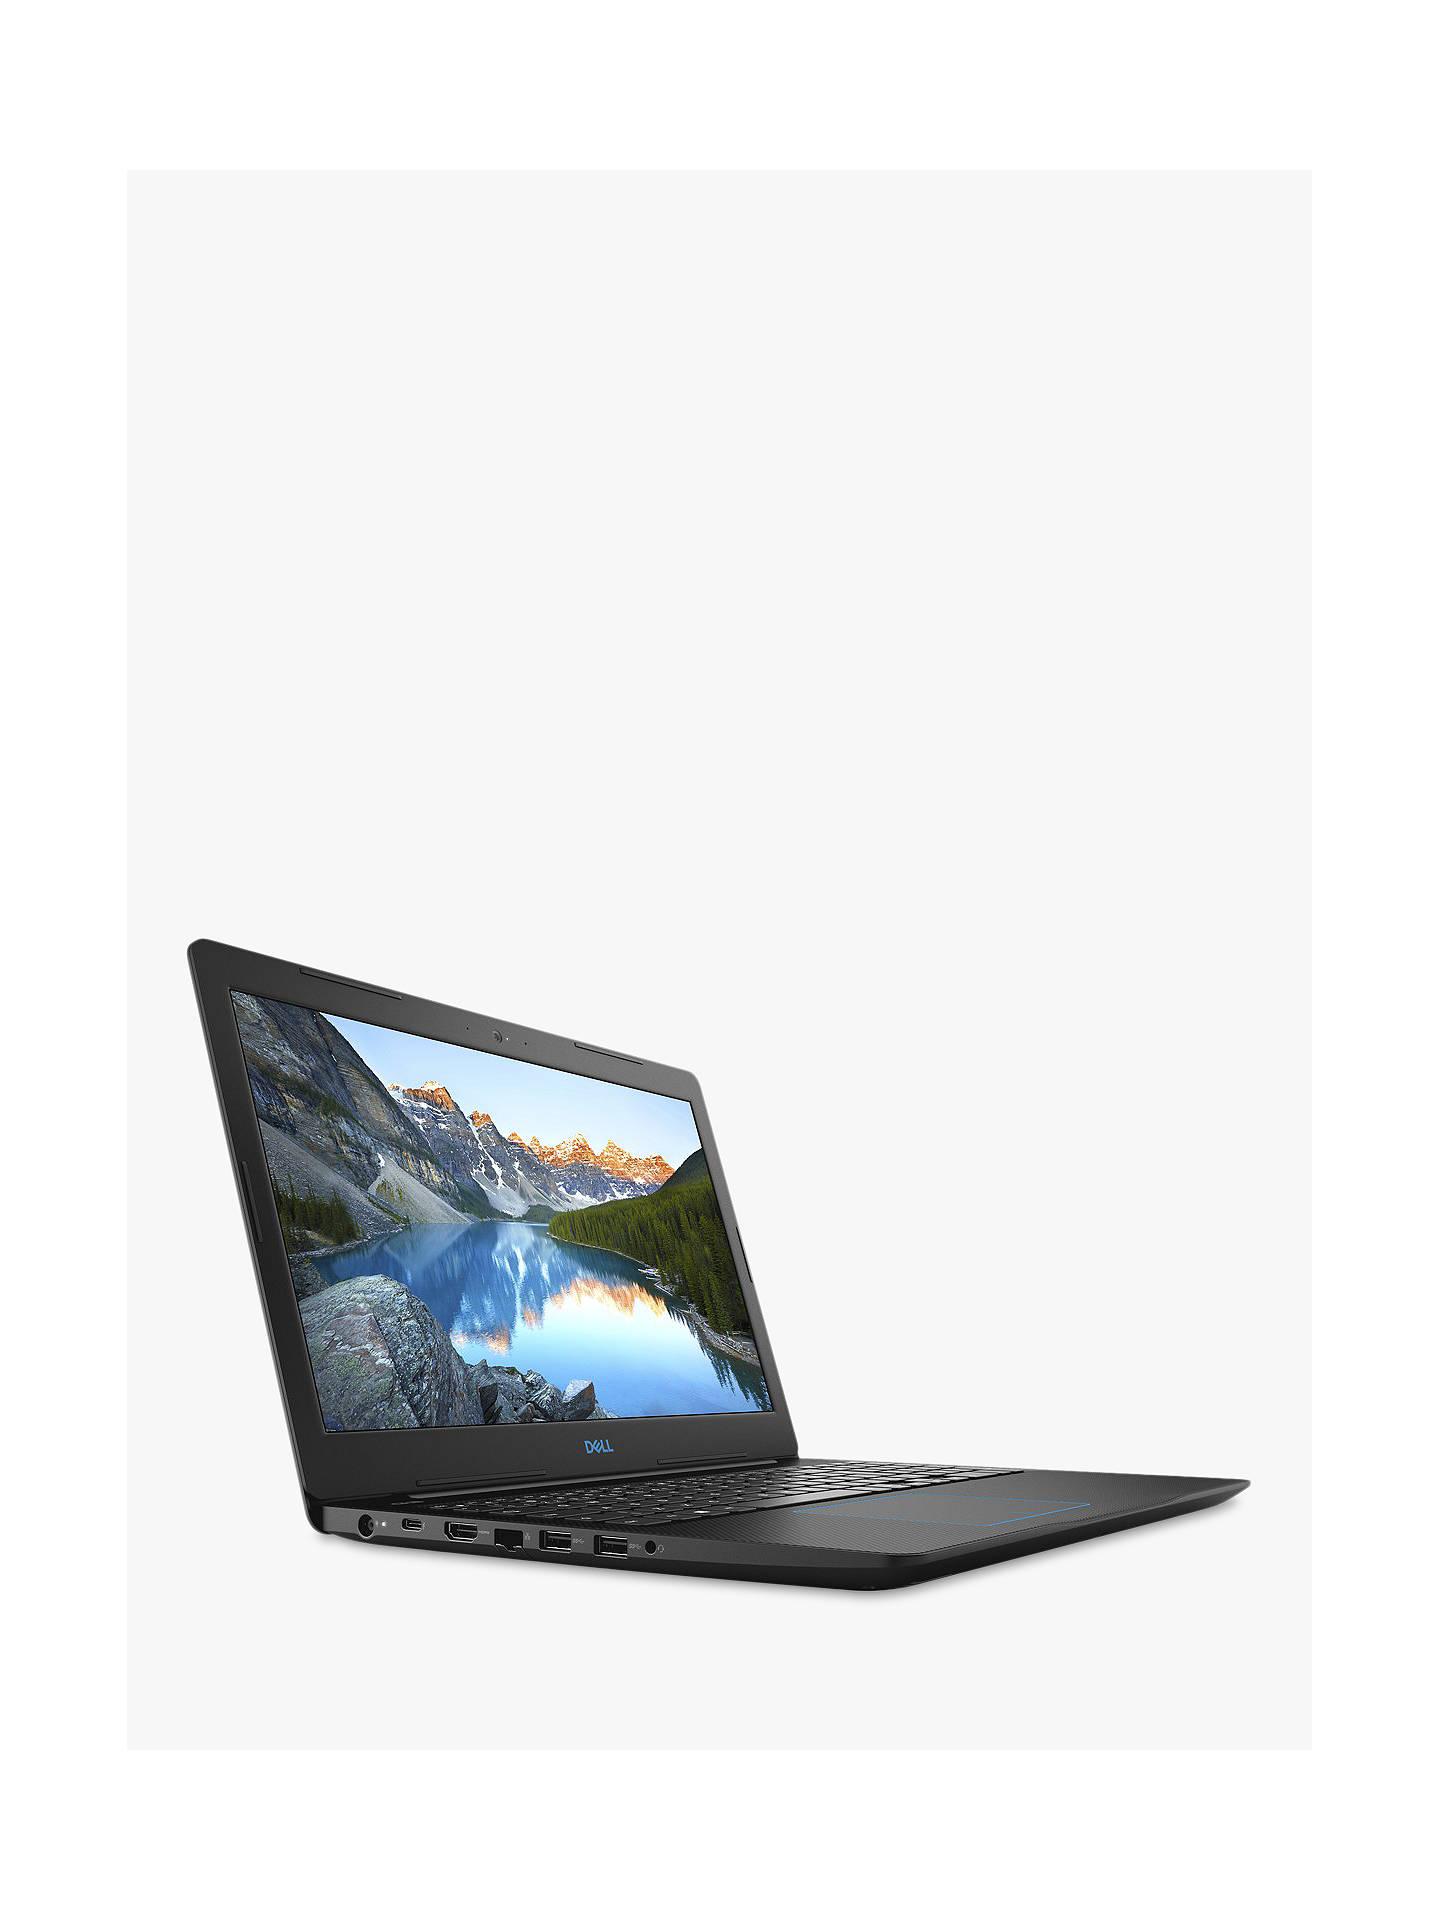 Dell G3 15-3000 Laptop, Intel® Core™ i5, 8GB RAM, NVIDIA GeForce GTX 1050,  256GB SSD, 15 6